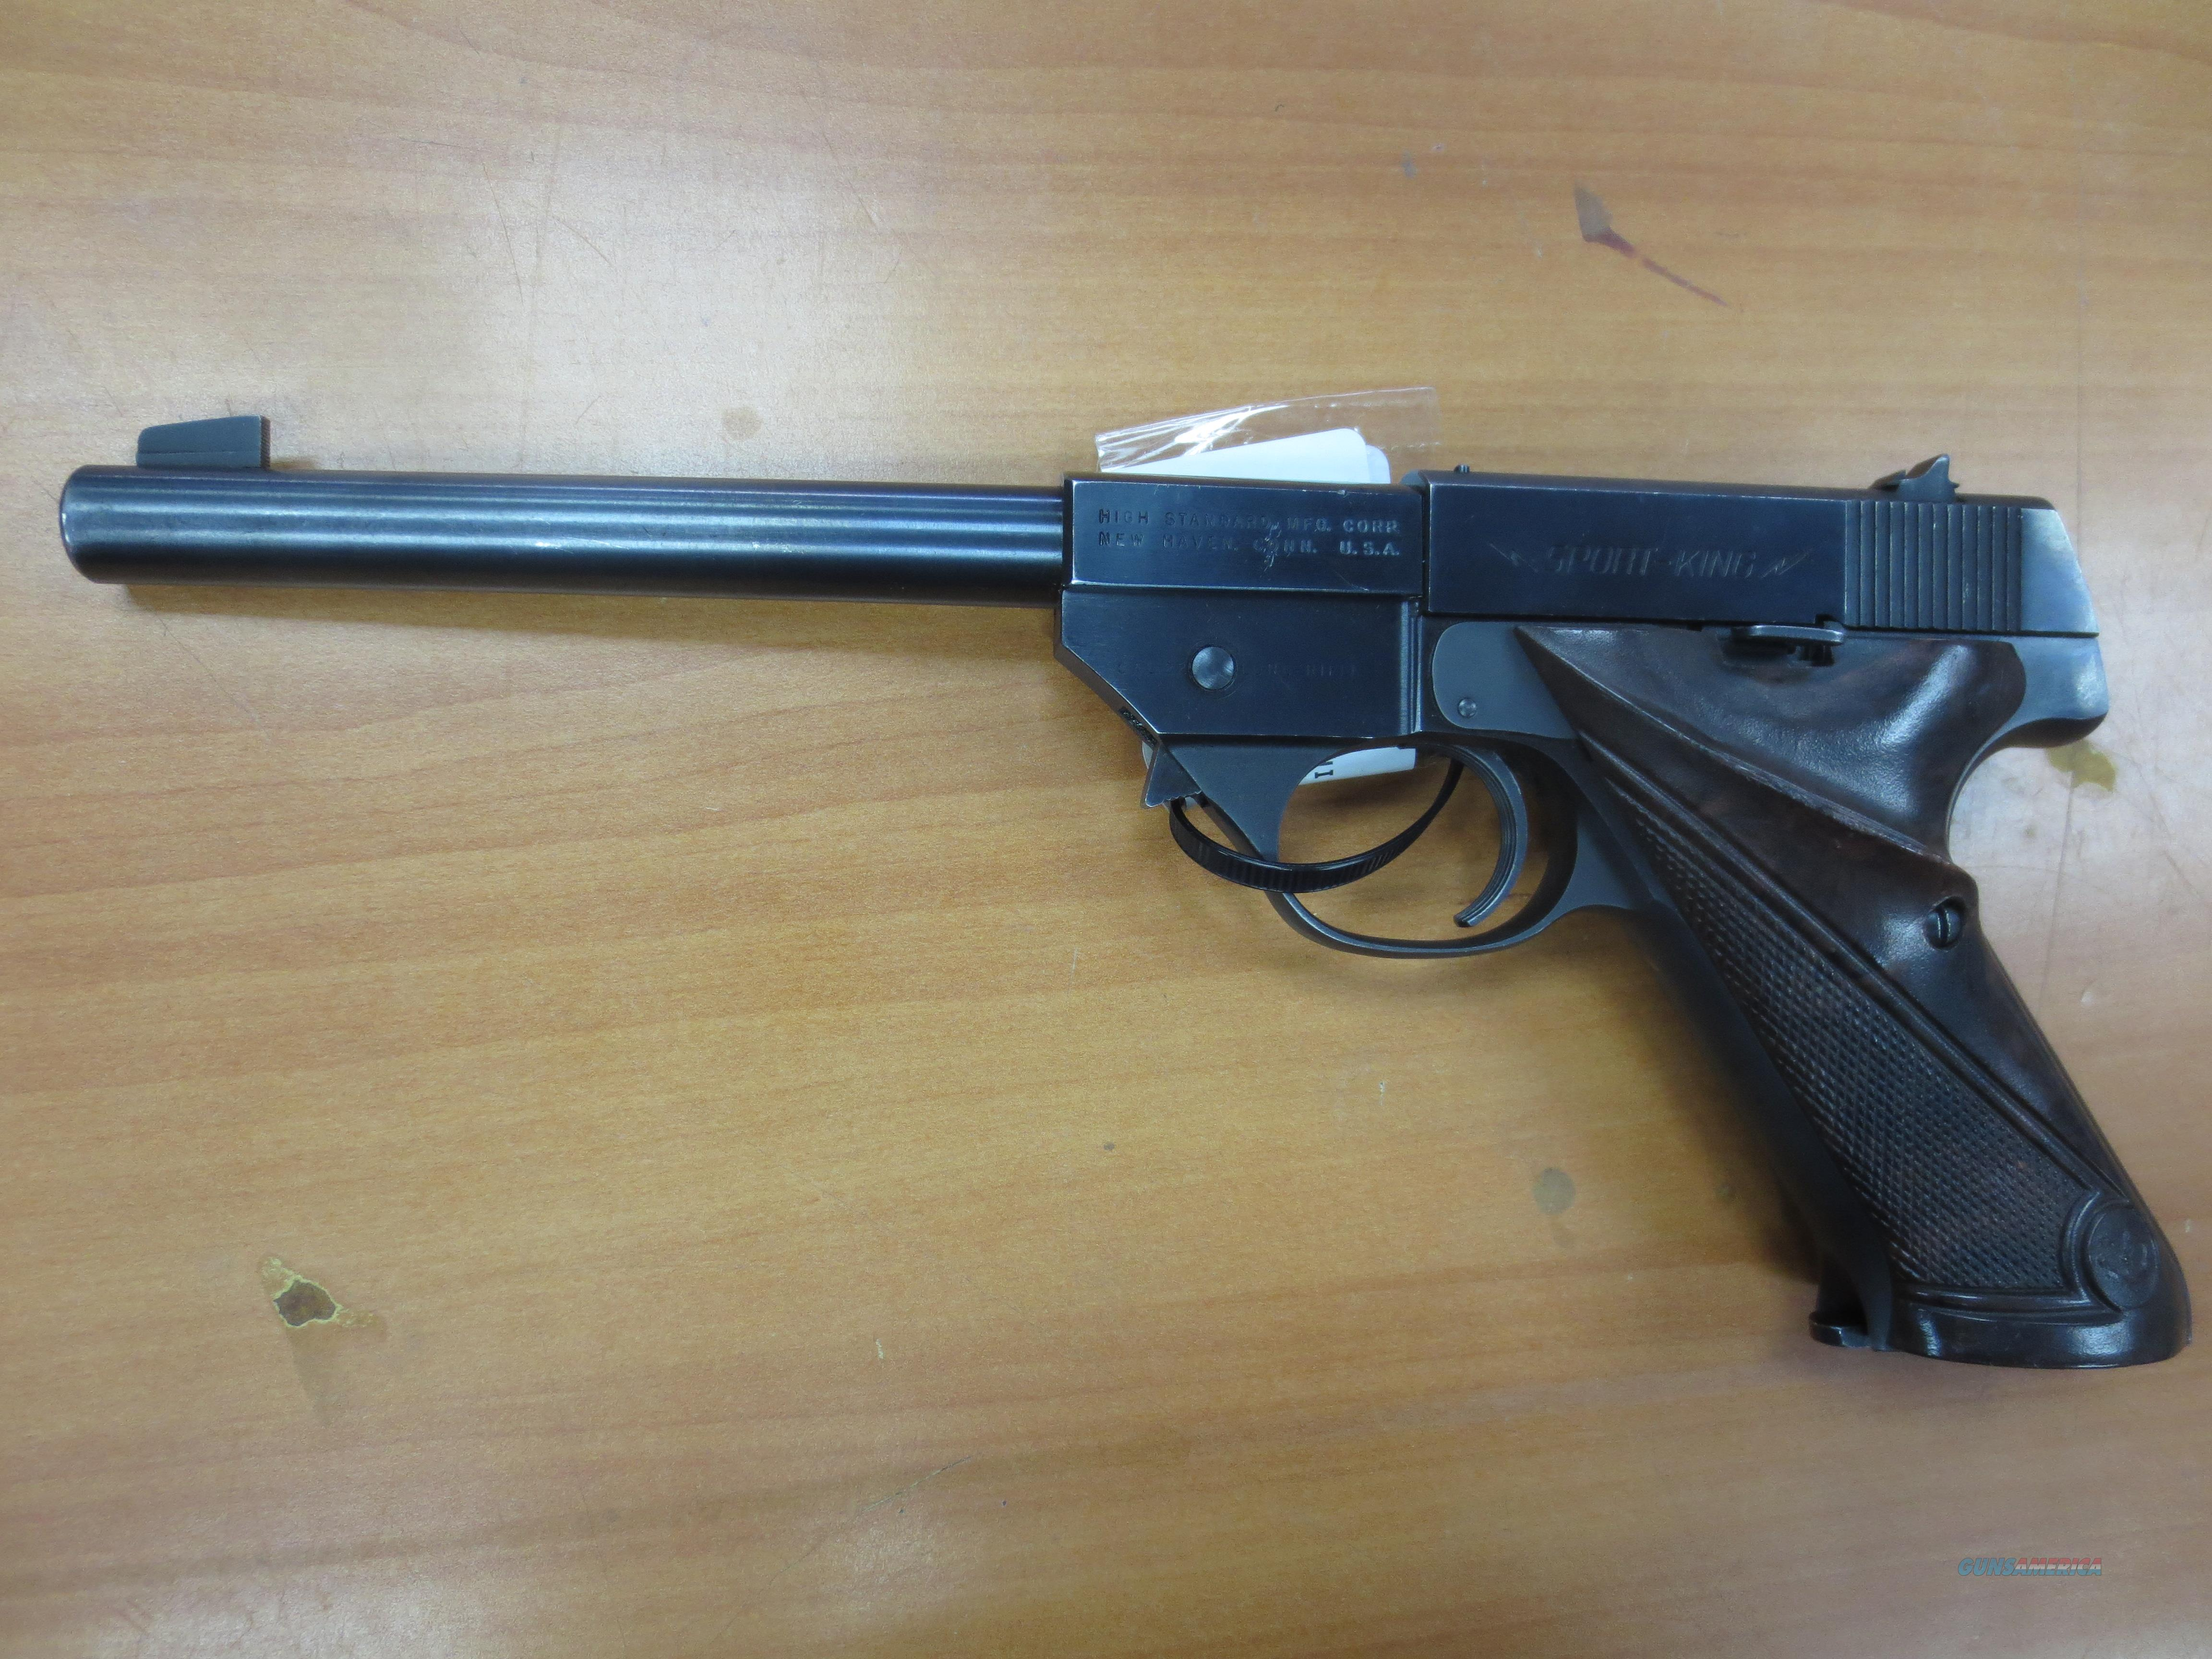 "High Standard Sport-King 6.75"" barrel .22lr cal  Guns > Pistols > High Standard Pistols"